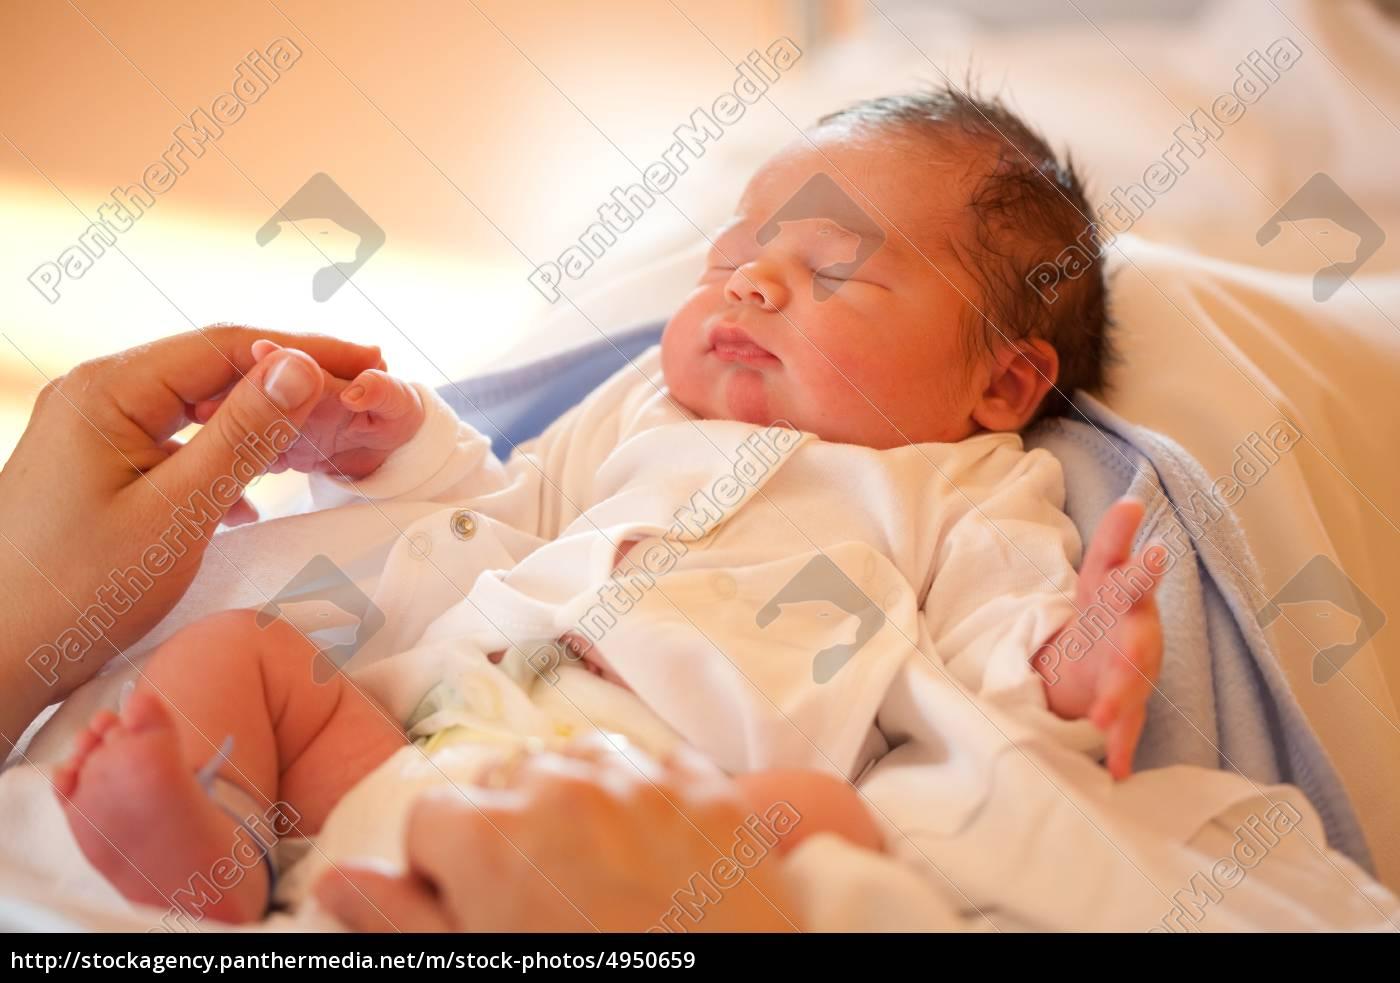 Lizenzfreies Bild 4950659 Neugeborenes Baby